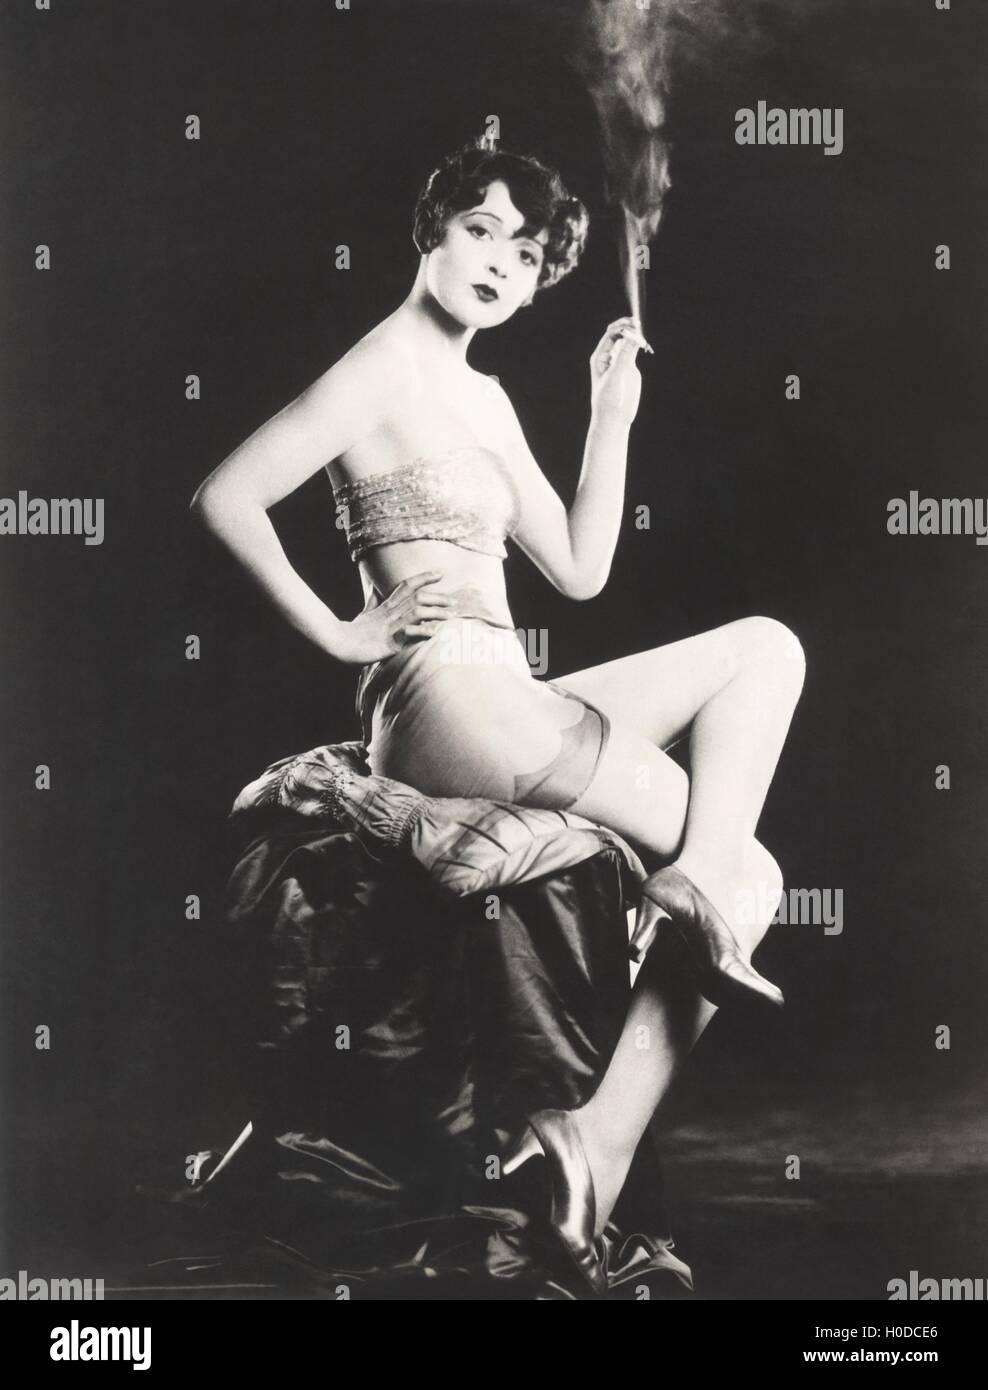 Scantily clad woman holding lit cigarette - Stock Image